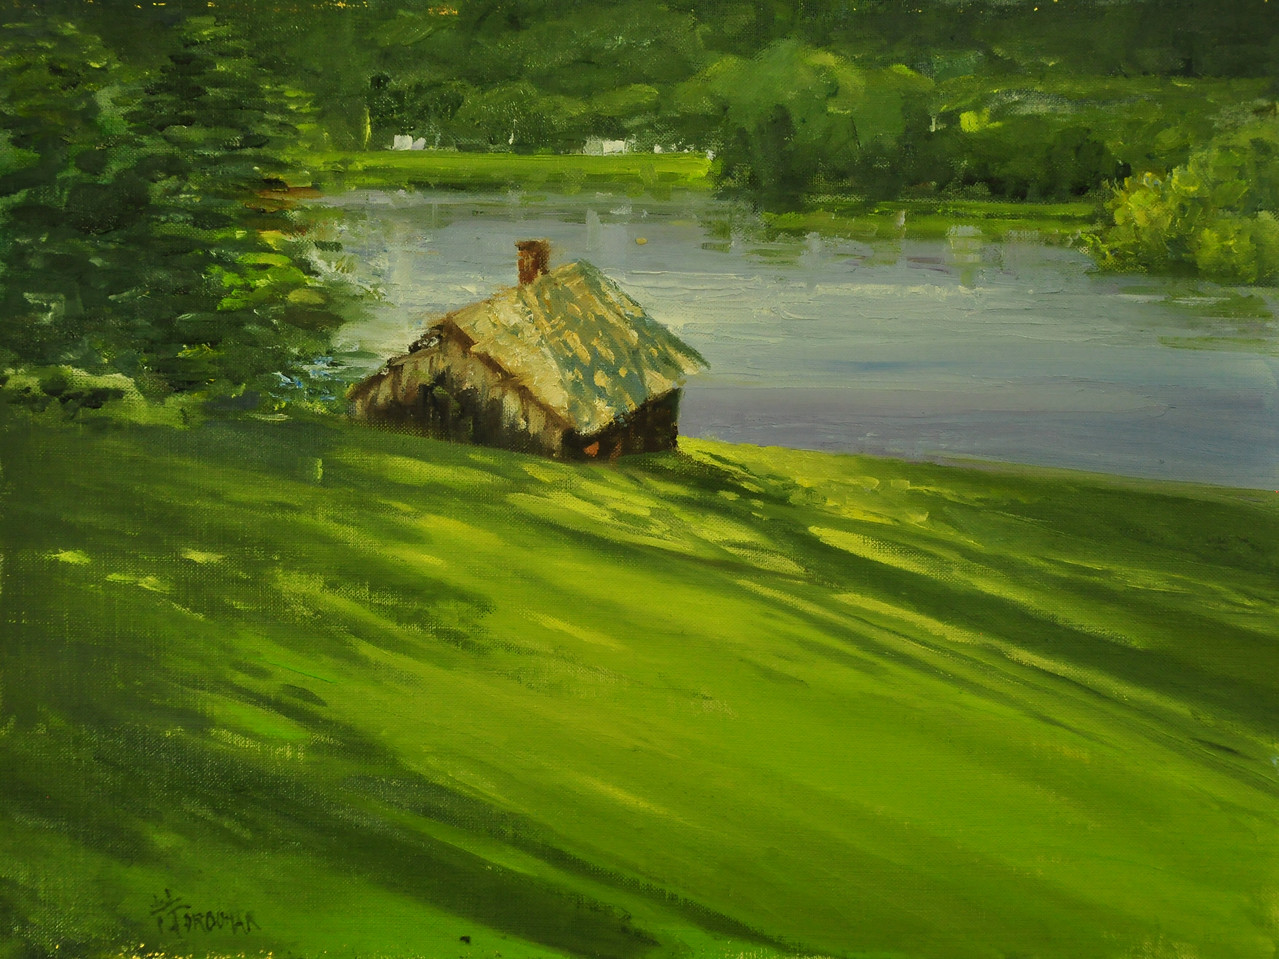 The Barn on Mystic Bay, Oil on Archival Linen Brd, 12x16